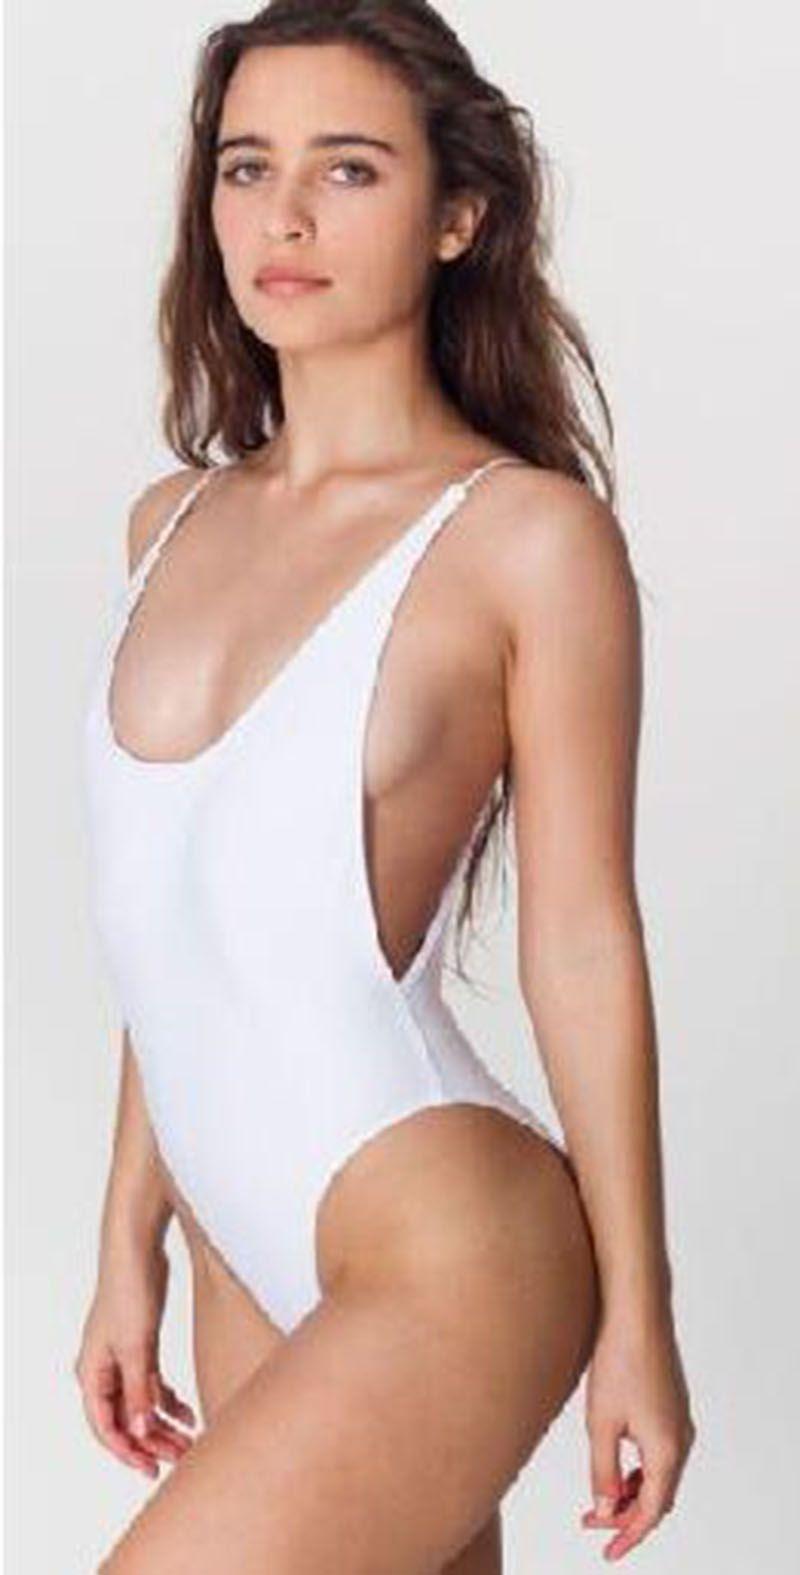 DHL FREE Sexy One piece bikini Women's Push-up Halter Monokini One Piece Bikini Swimsuit Beachwear Swimwear